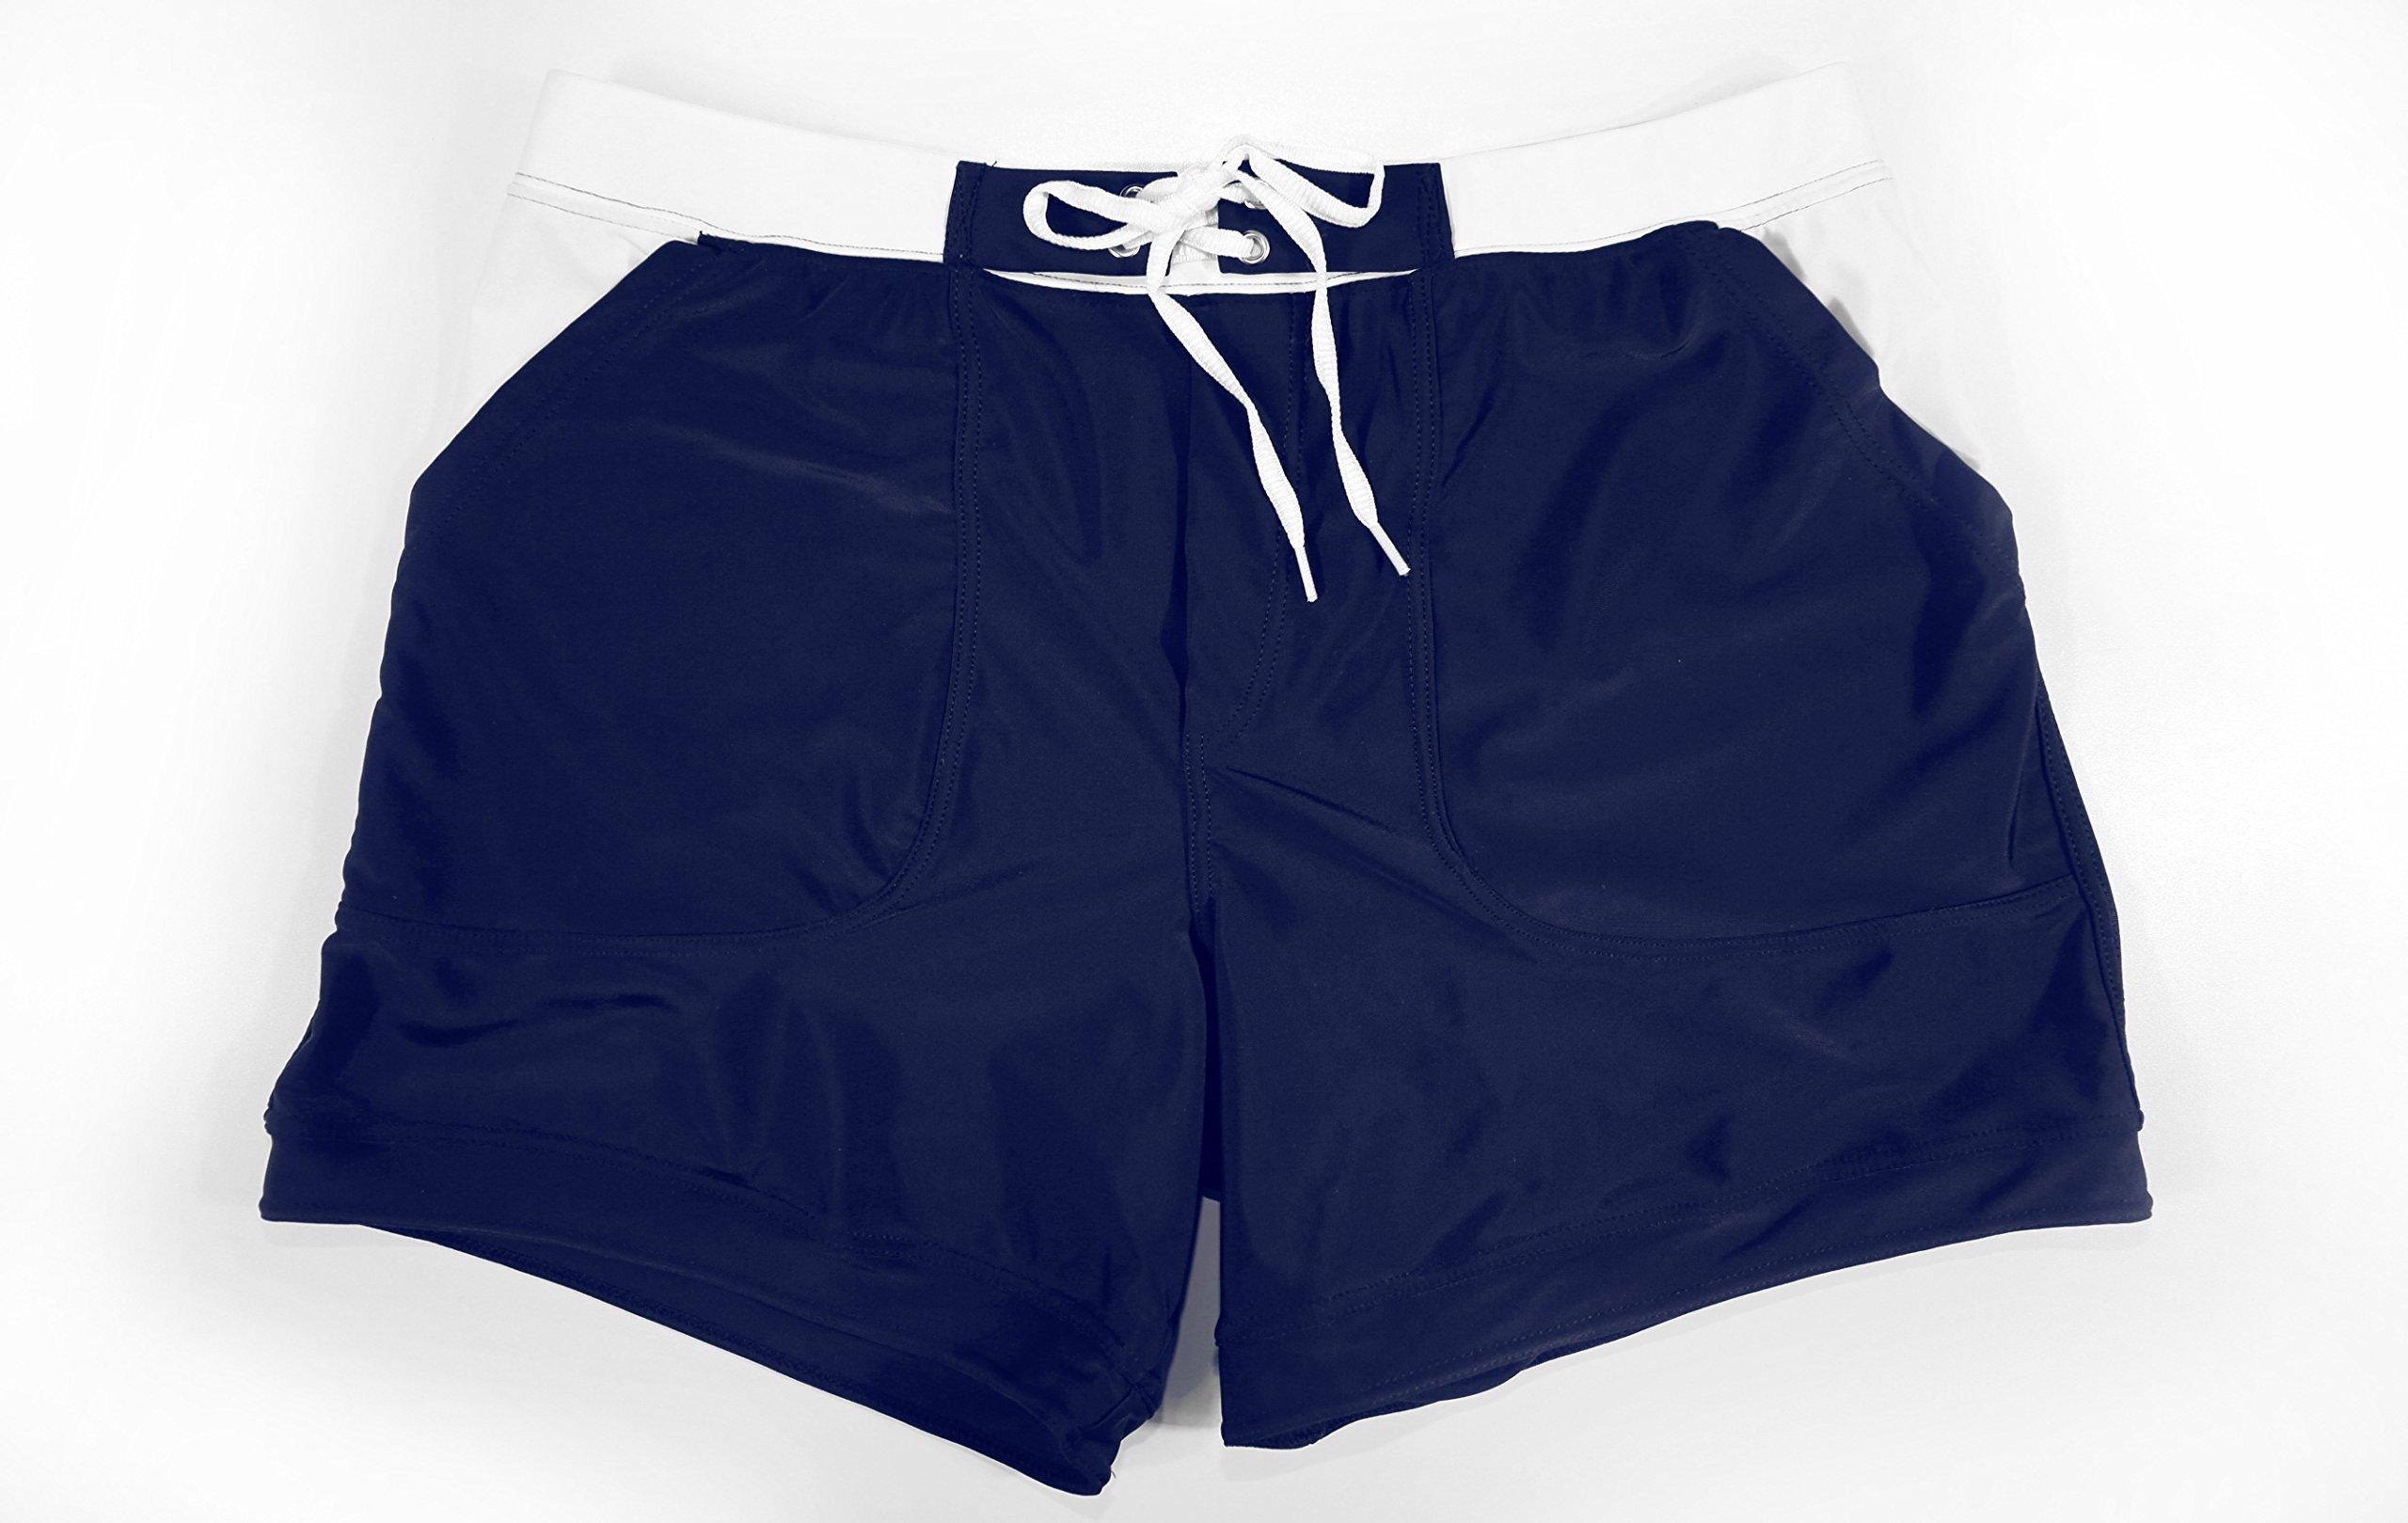 TADDLEE Men Swimwear Swimsuits Solid Basic Long Swim Boxer Trunks Board Shorts